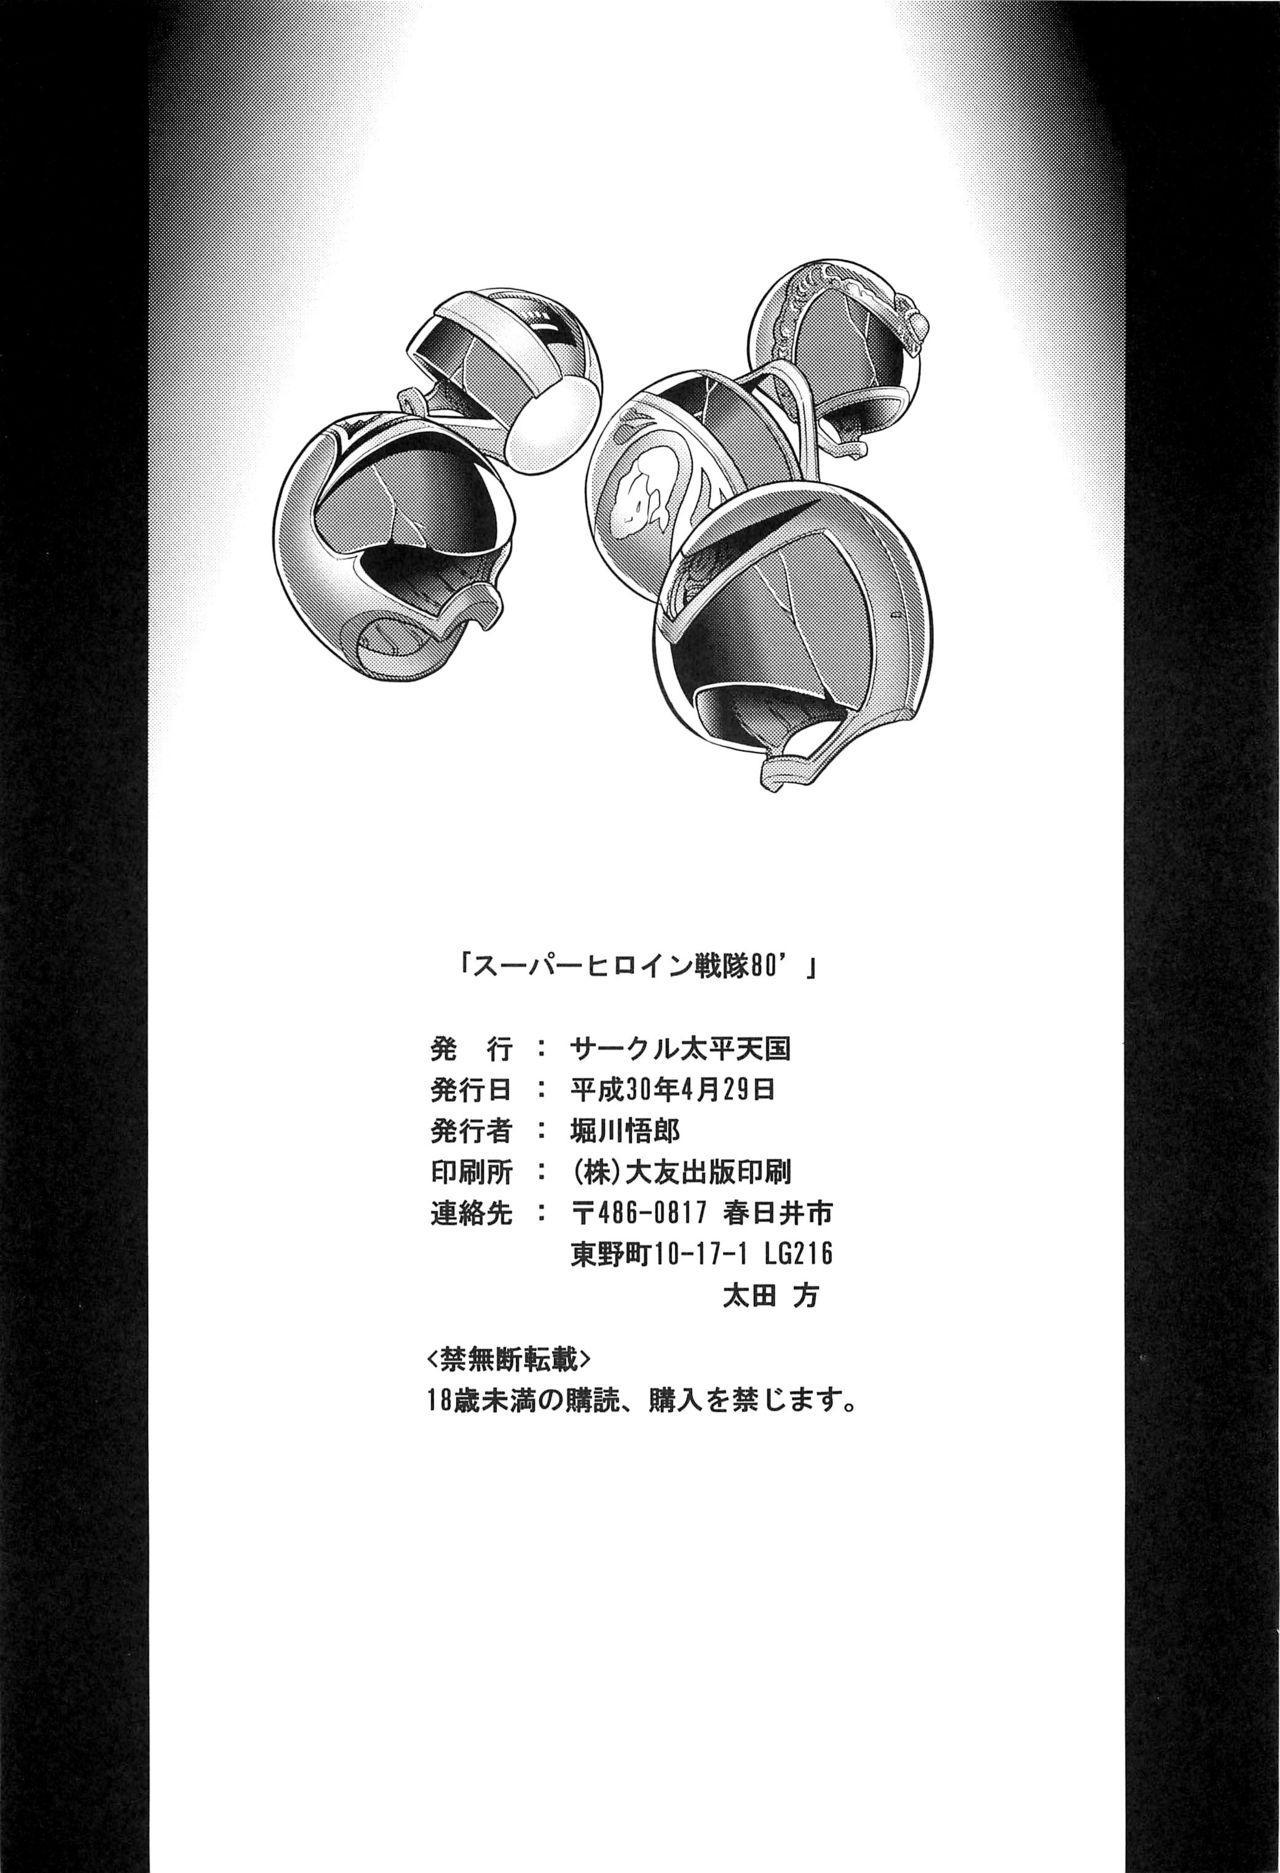 <<Tokusatsu>> Superheroine Sentai 80's 58